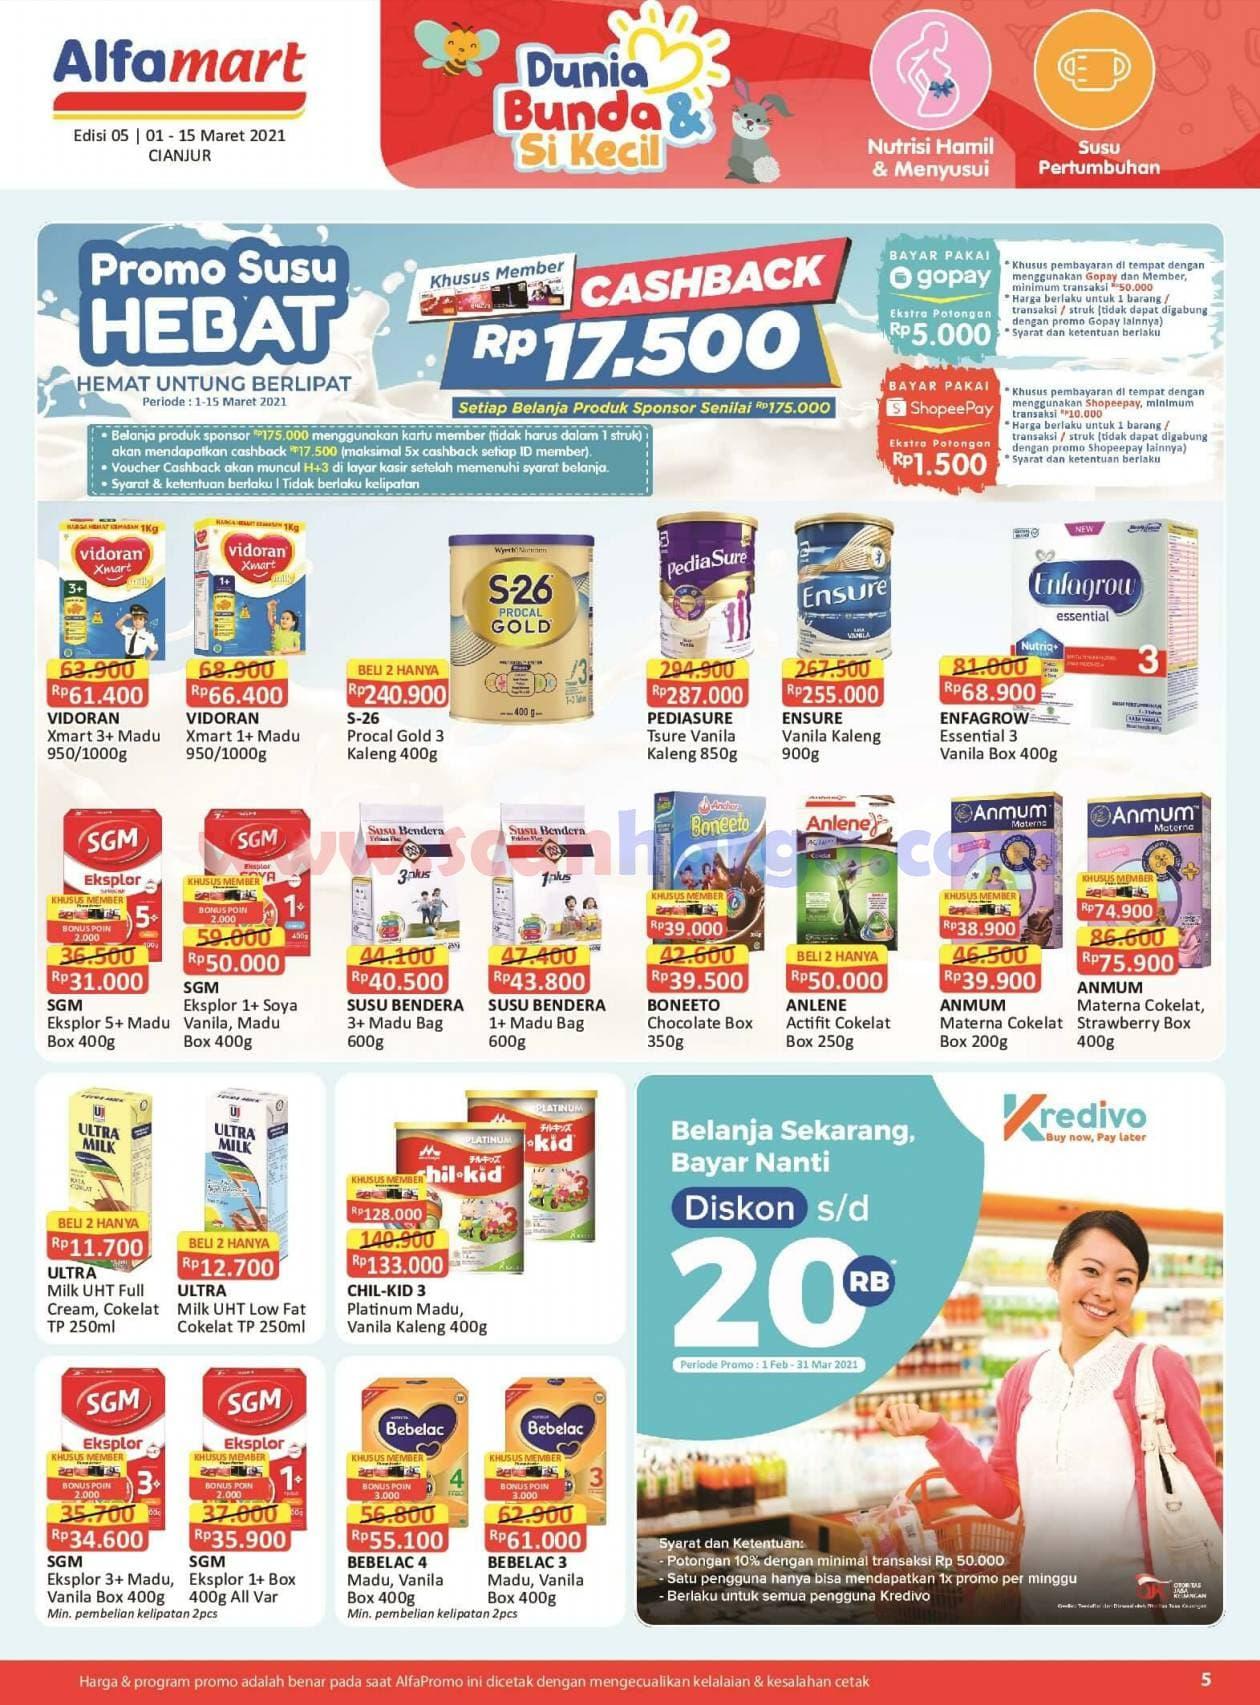 Katalog Promo Alfamart 1 - 15 Maret 2021 5